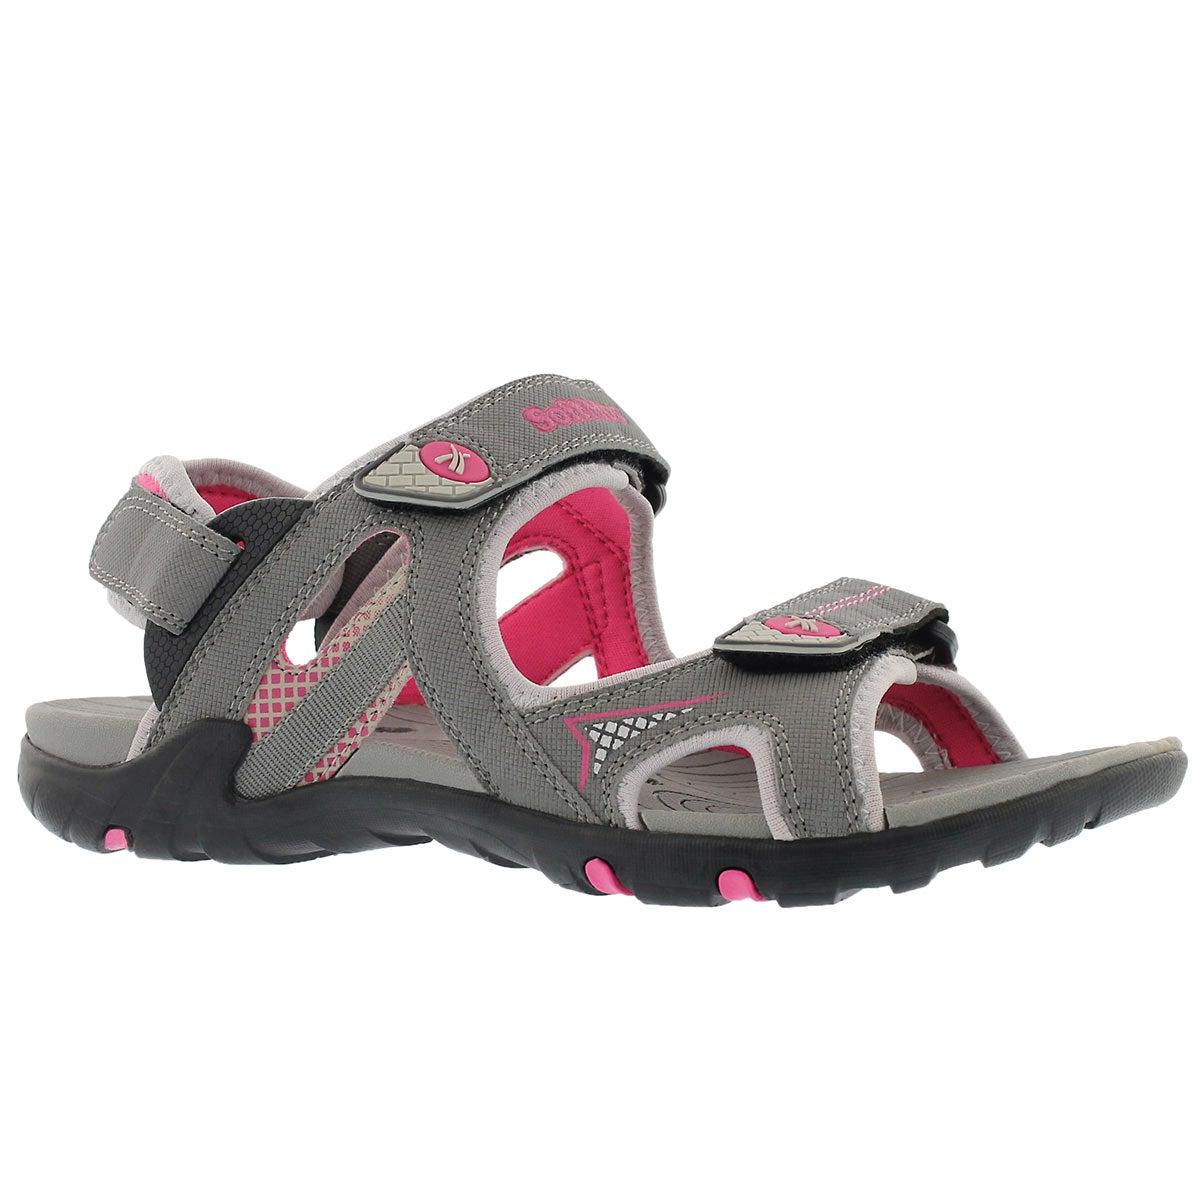 Women's KATELYN grey 3 strap sport sandals